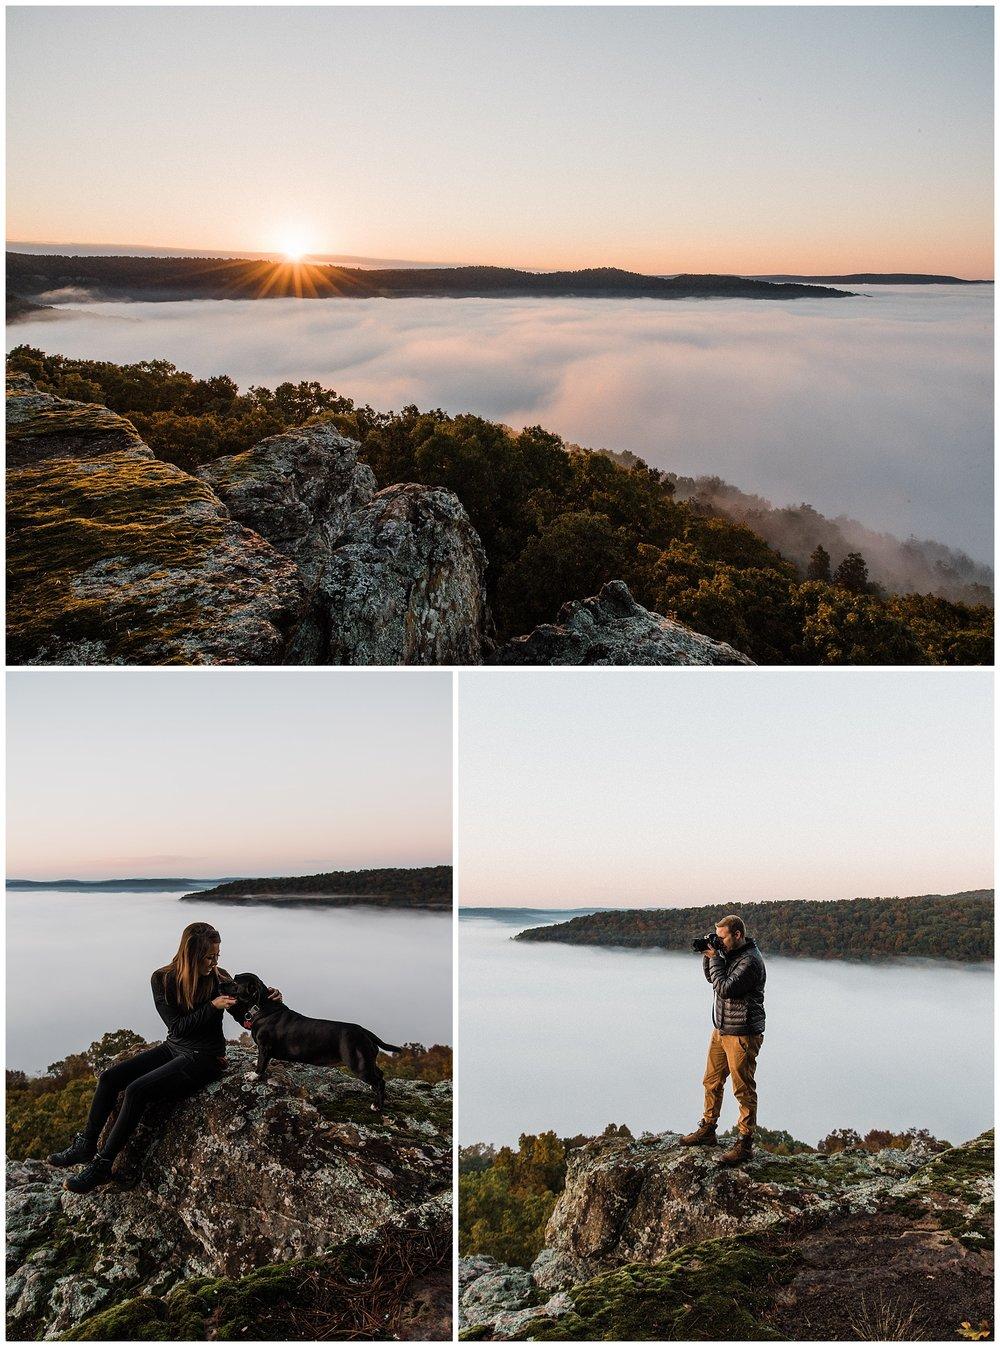 sunrise photography in arkansas tanner burge photo